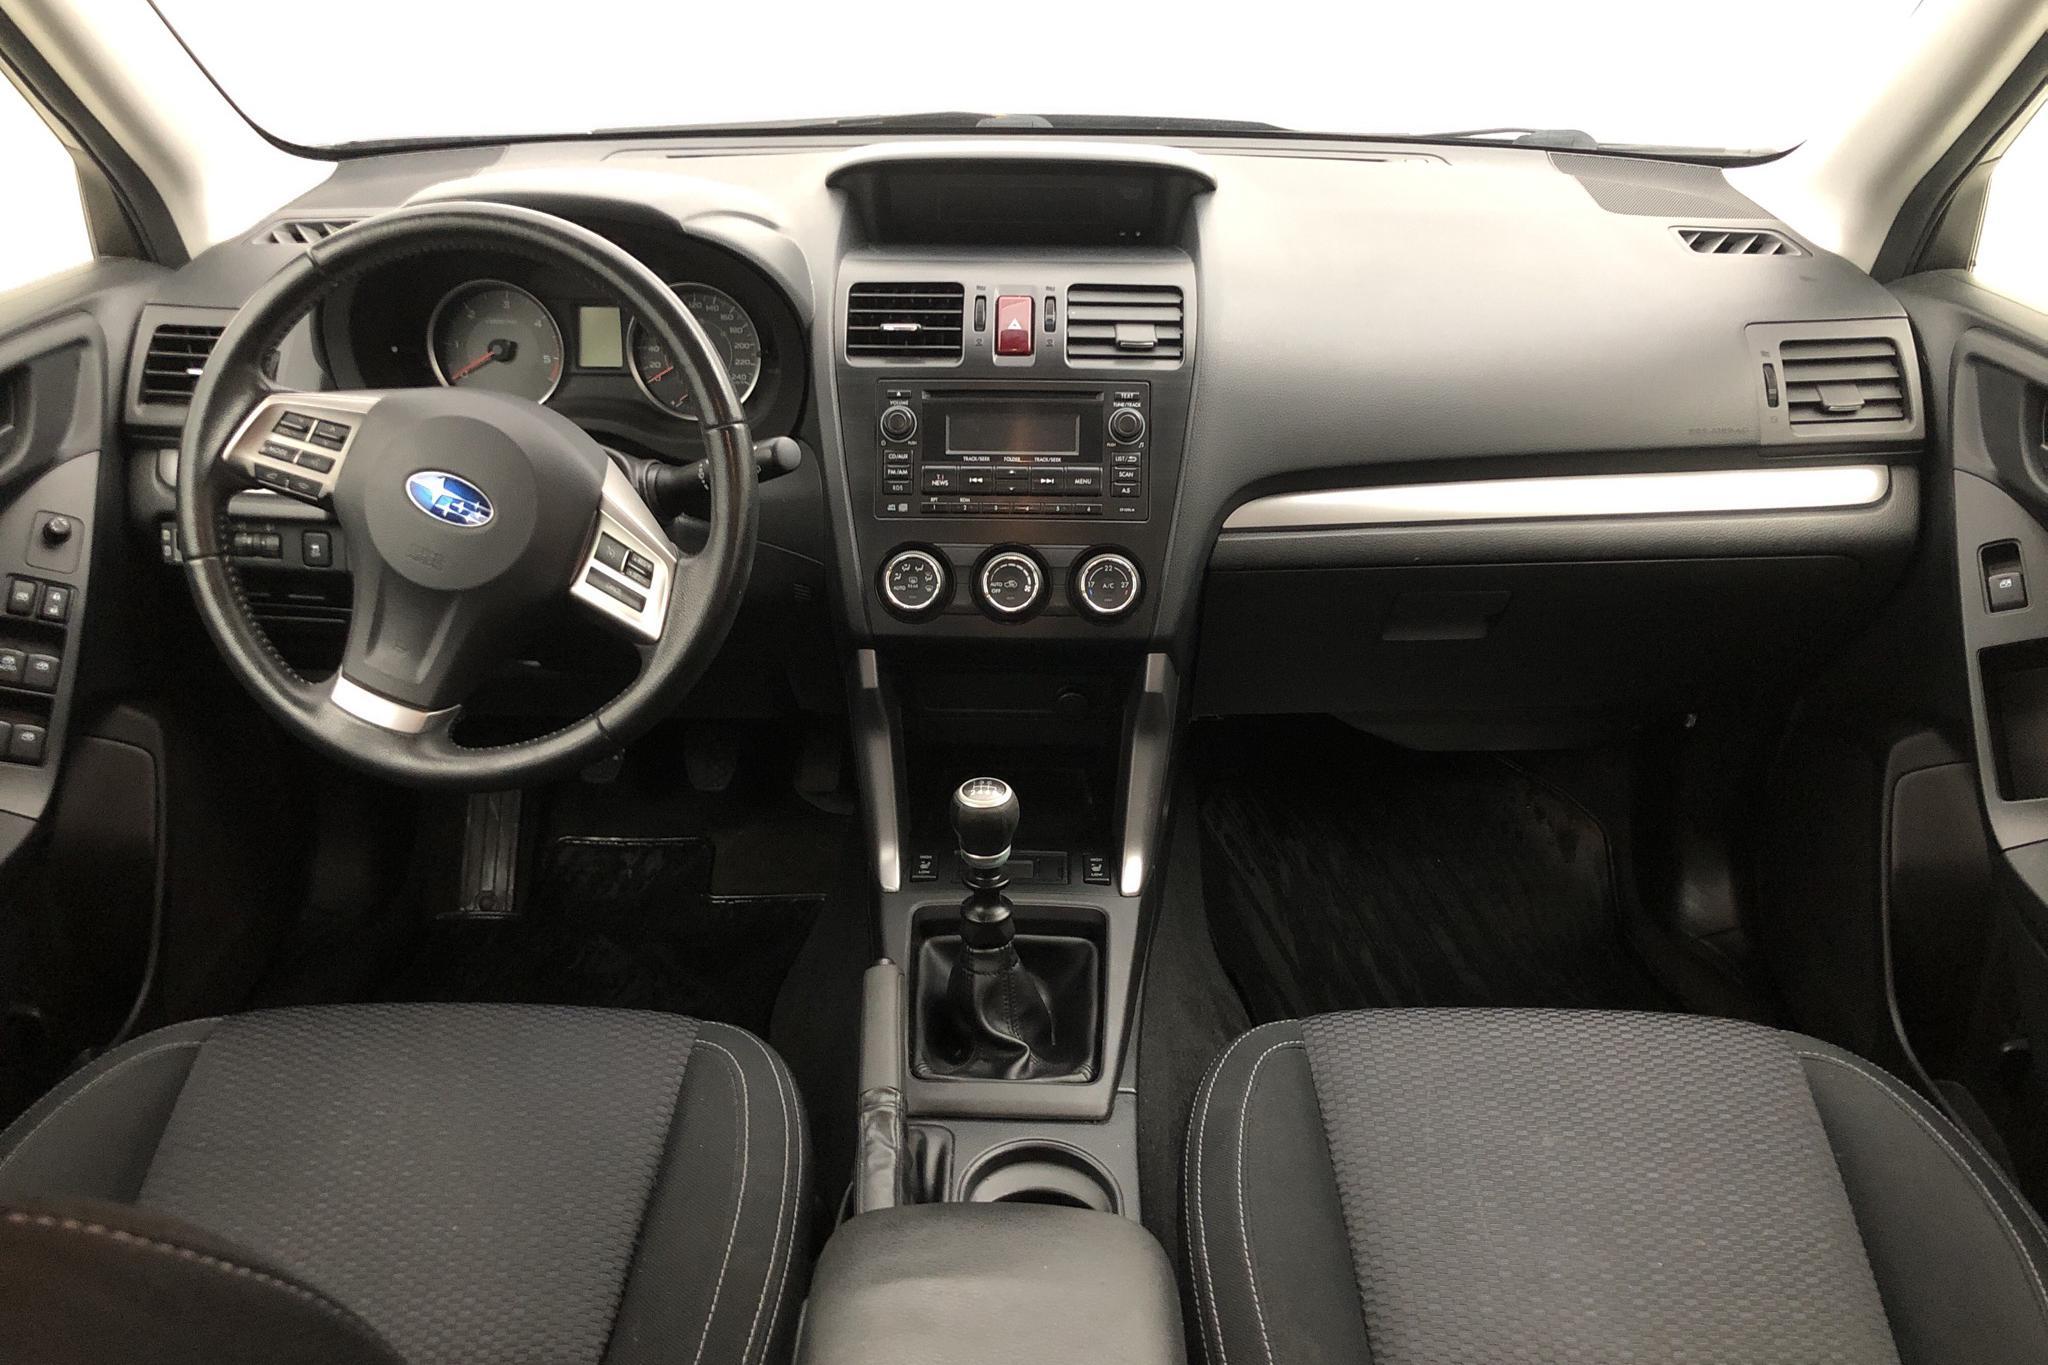 Subaru Forester 2.0D (147hk) - 182 400 km - Manual - black - 2013